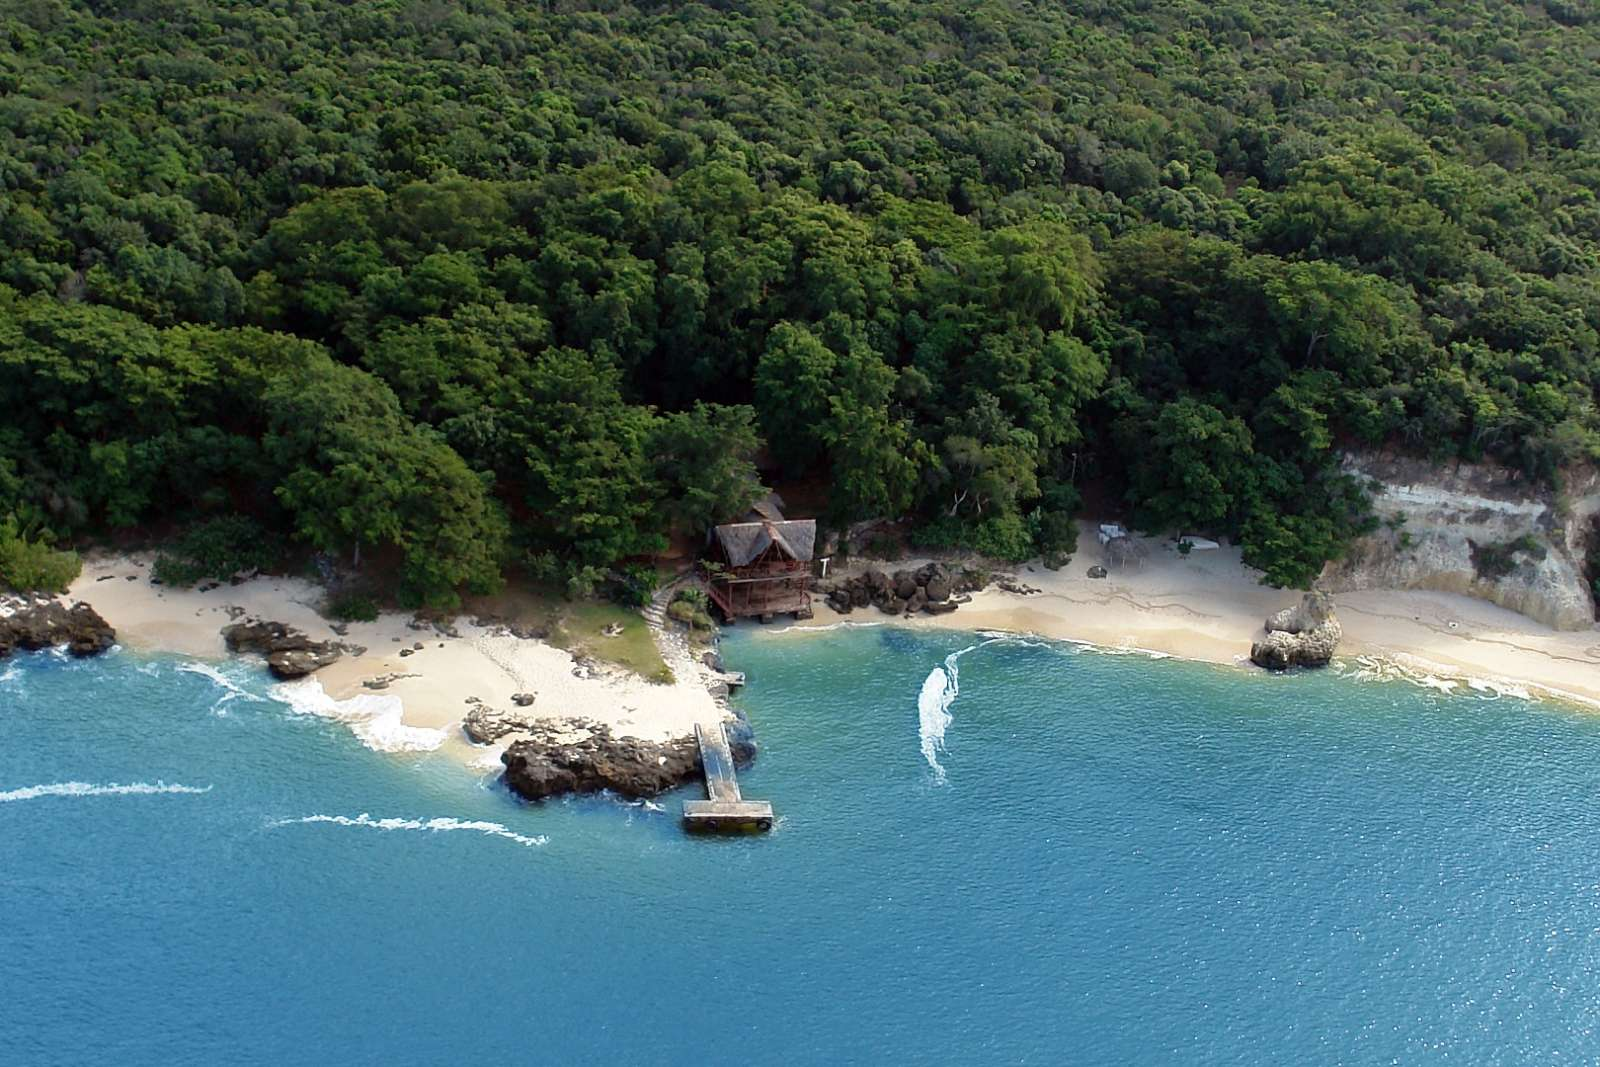 The island of Cayo Saetia near Guardalavaca